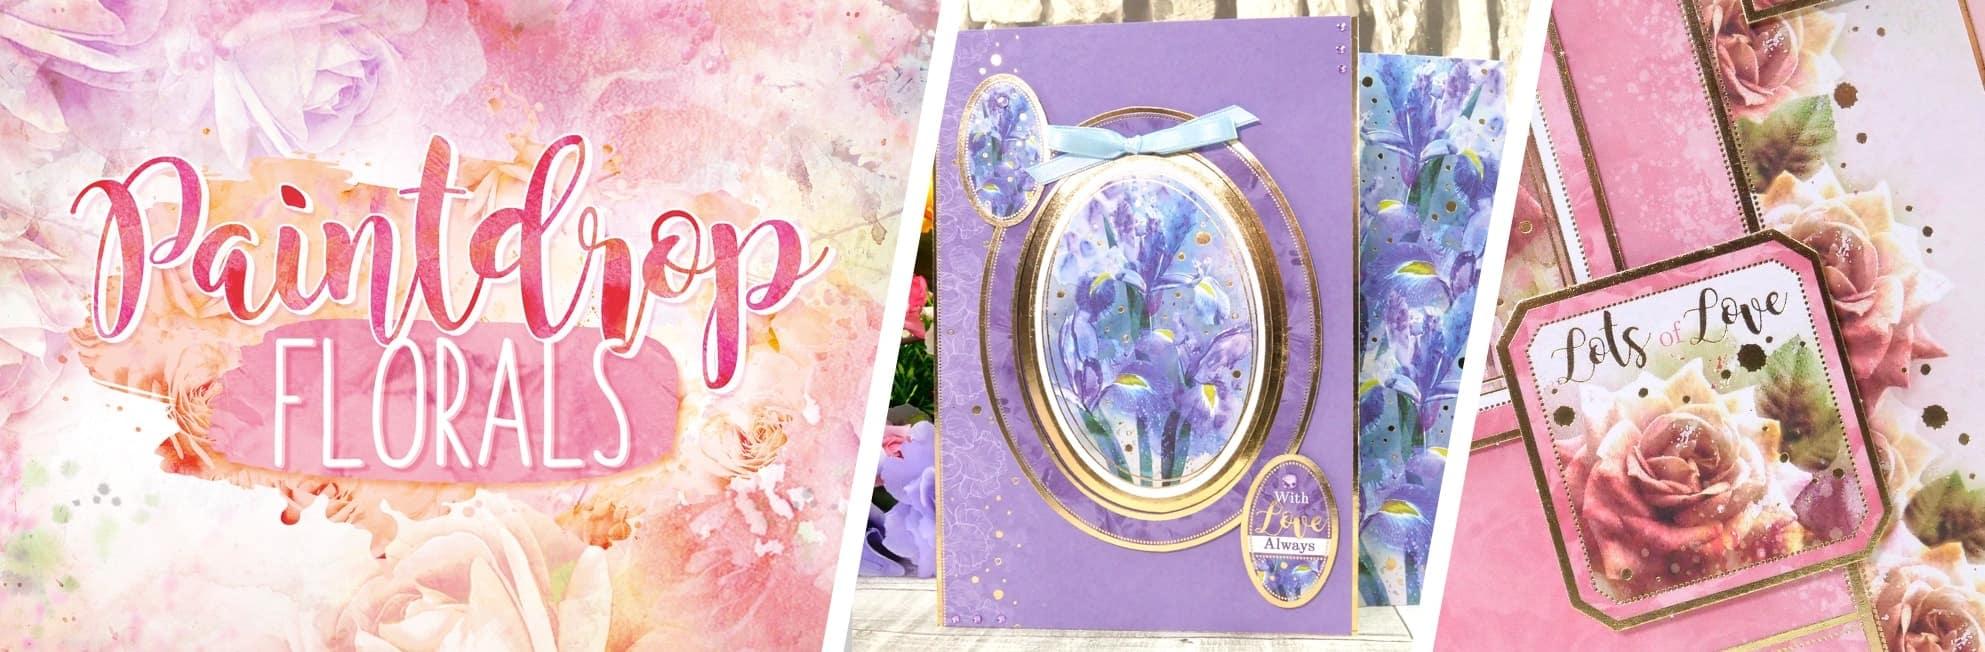 Paintdrop Florals Collection